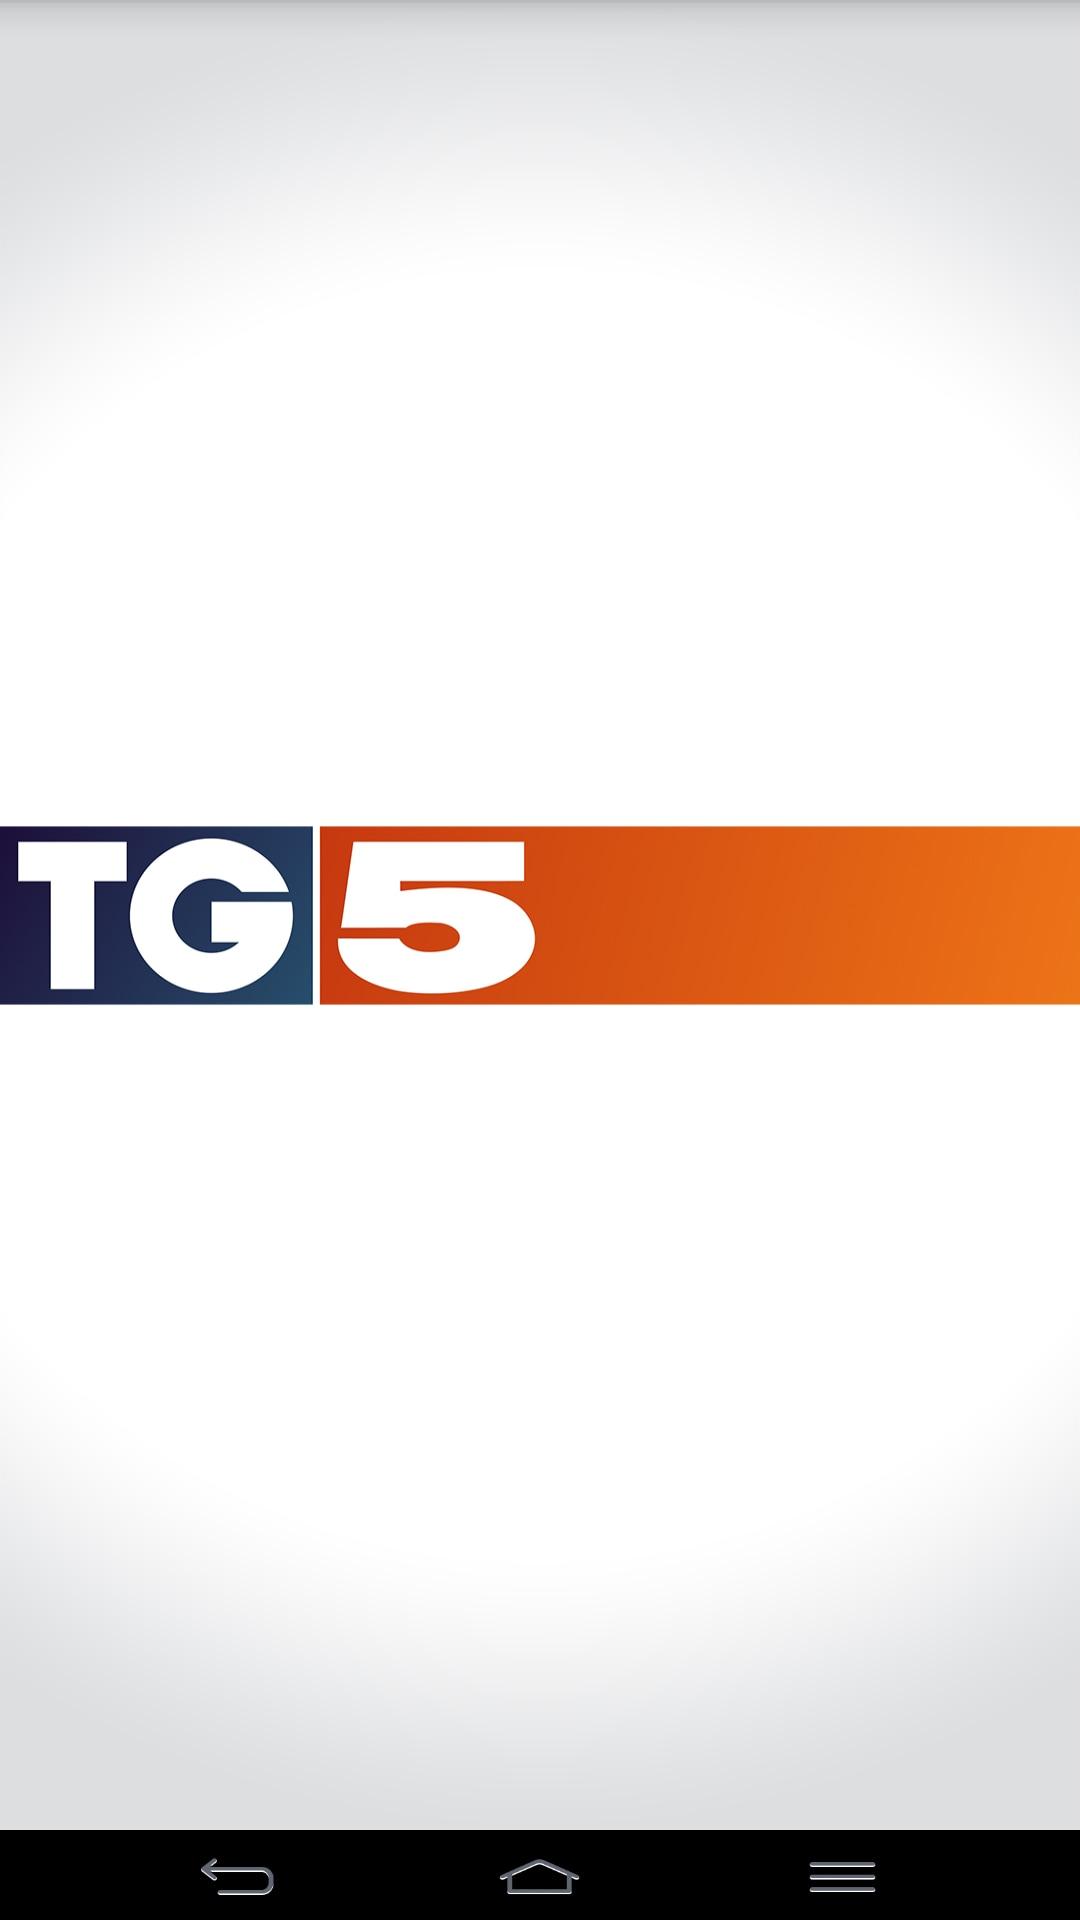 tg5_applicazione_streaming (2)